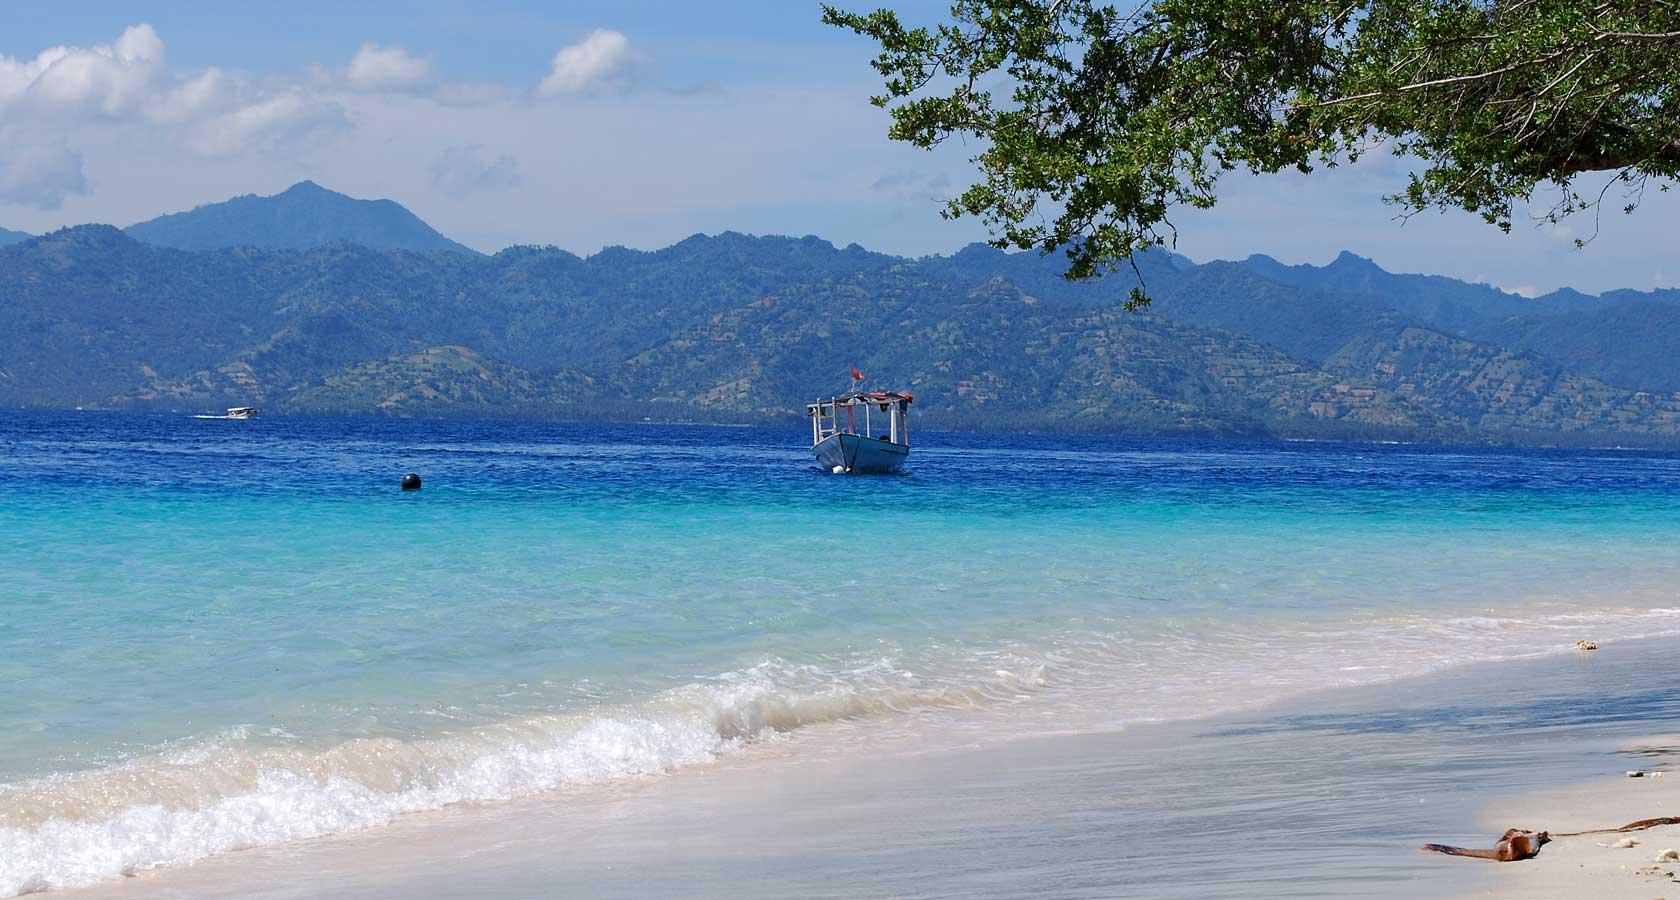 пляж острова гили траванган индонезия